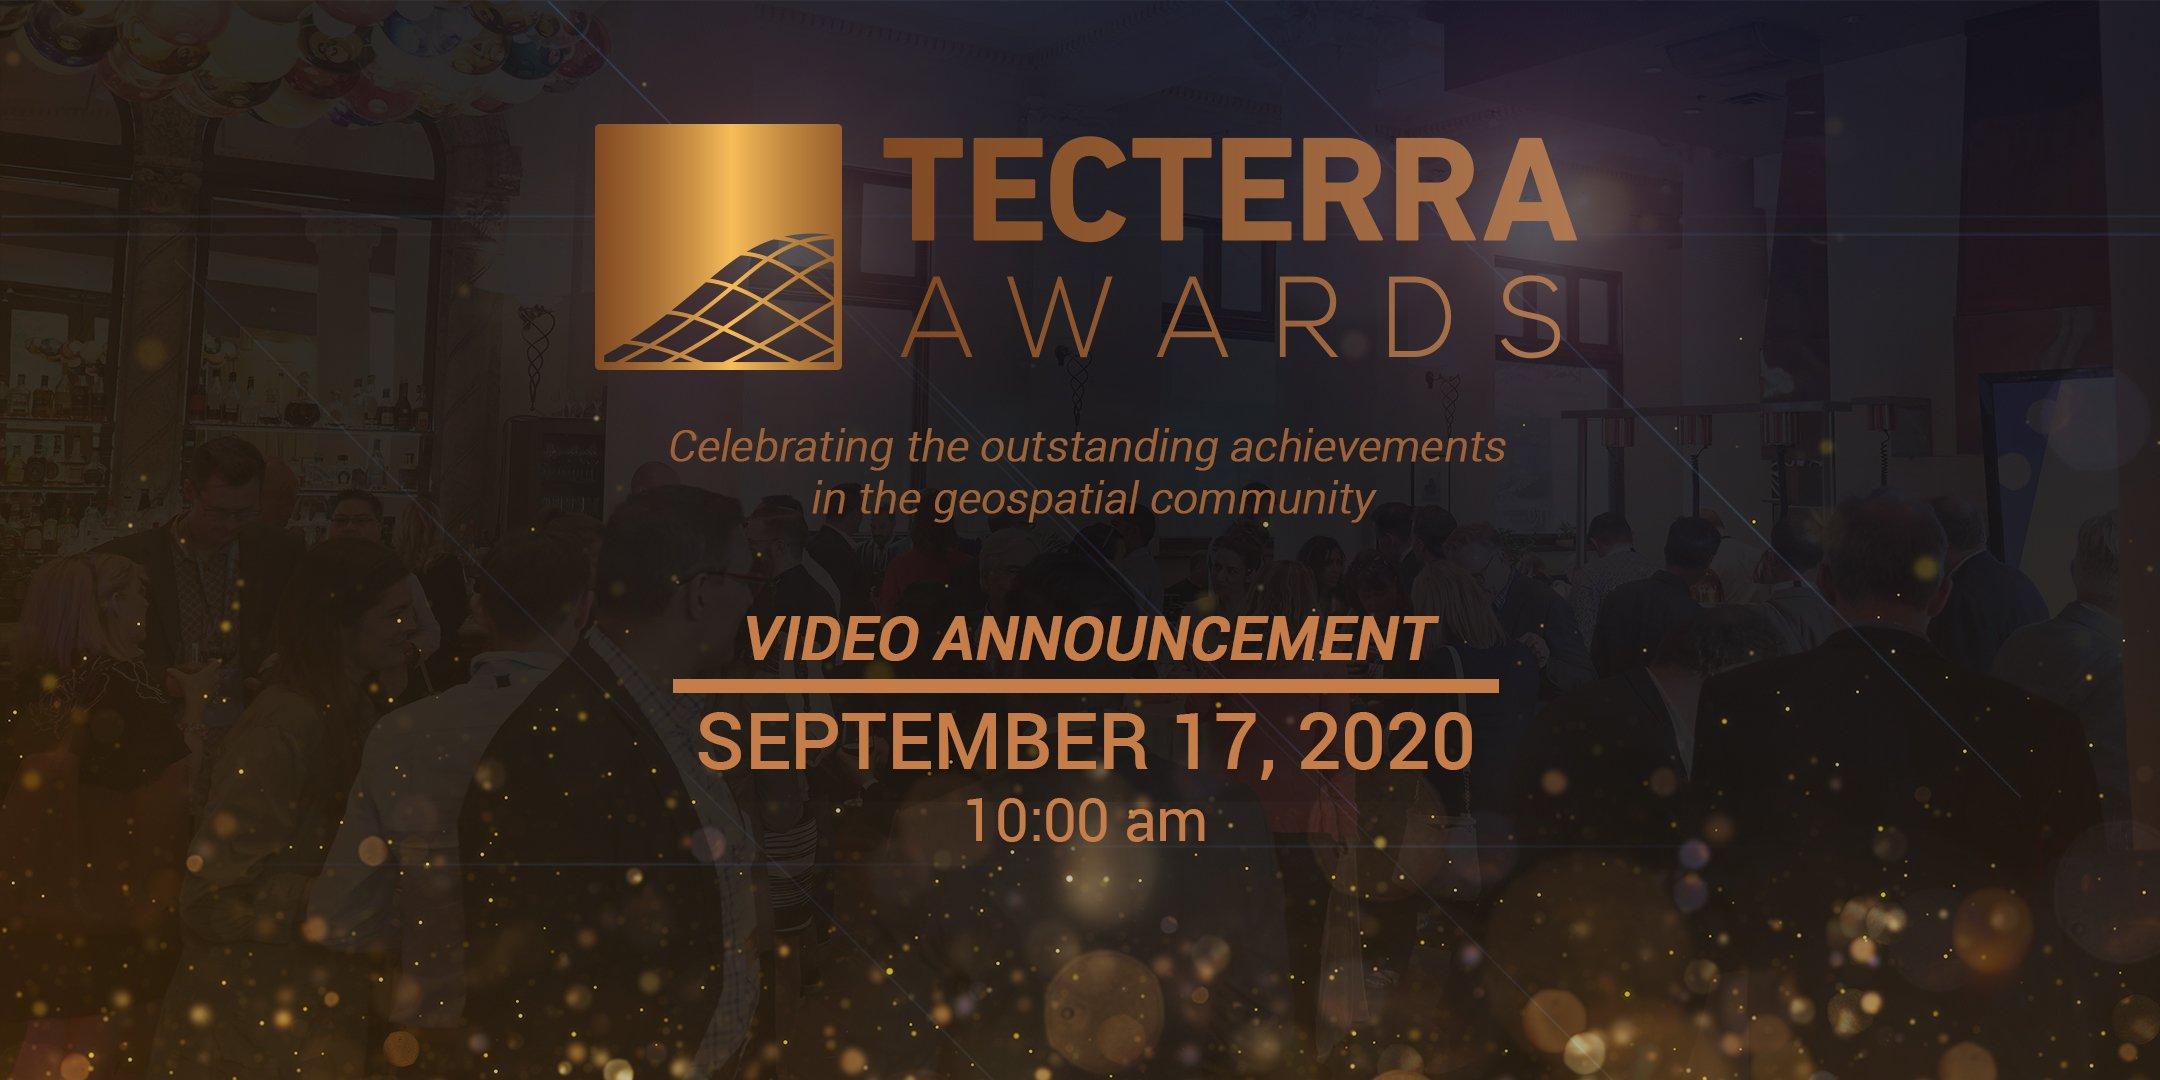 TECTERRA_Awards_VideoAnnouncement (1)